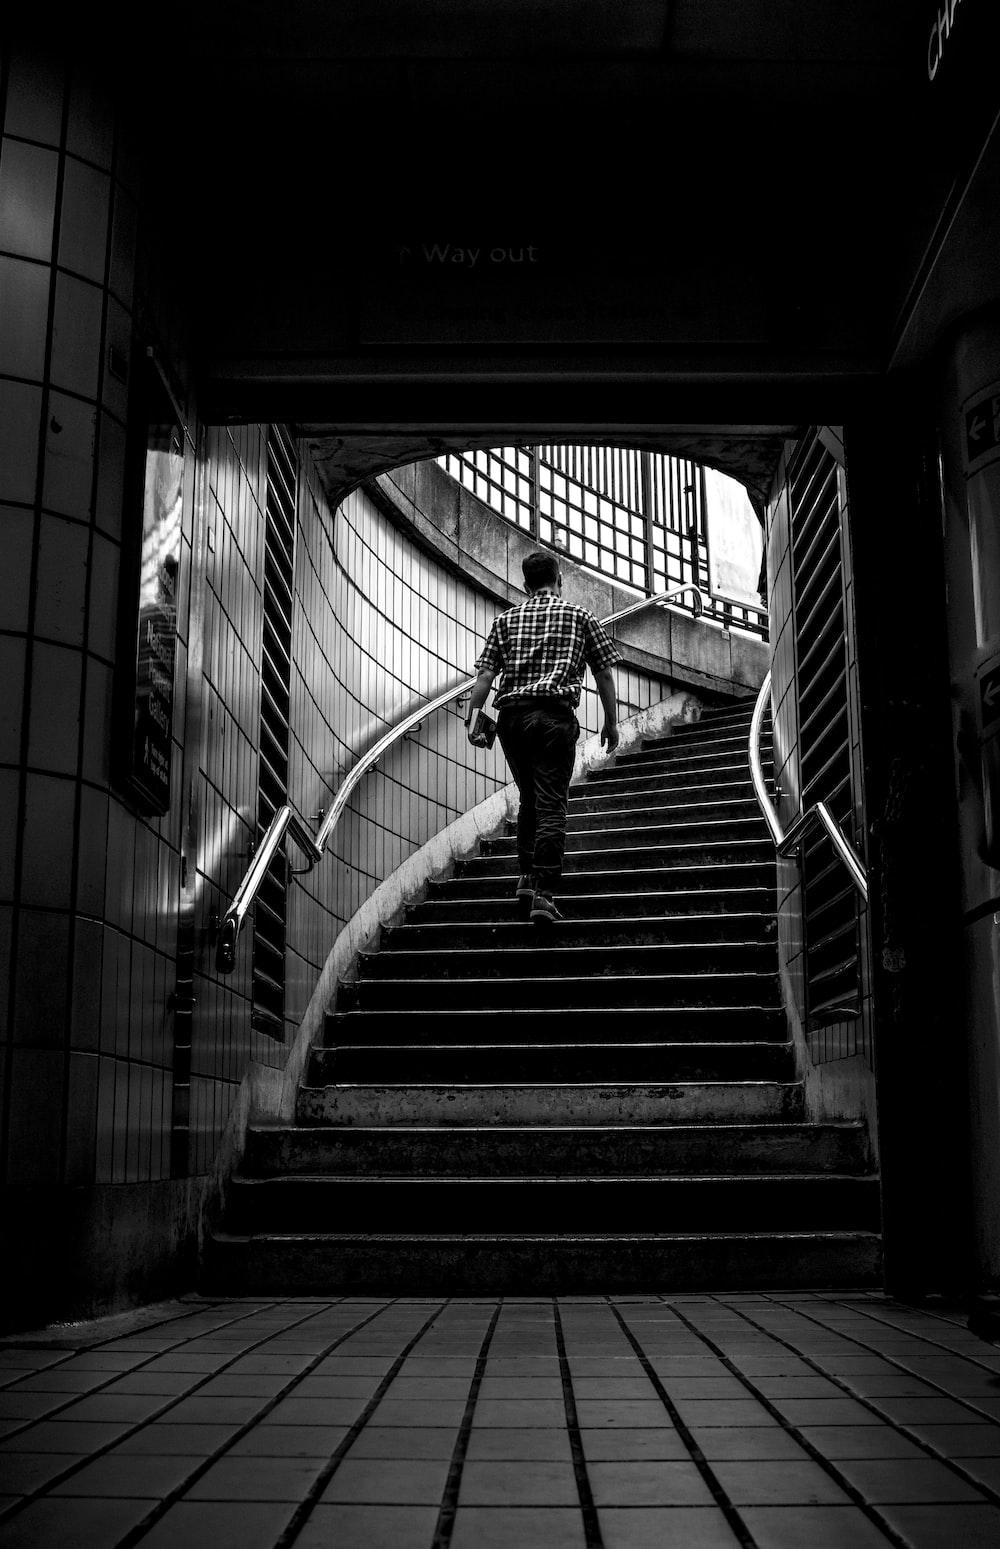 grayscale photo of man walking upstairs